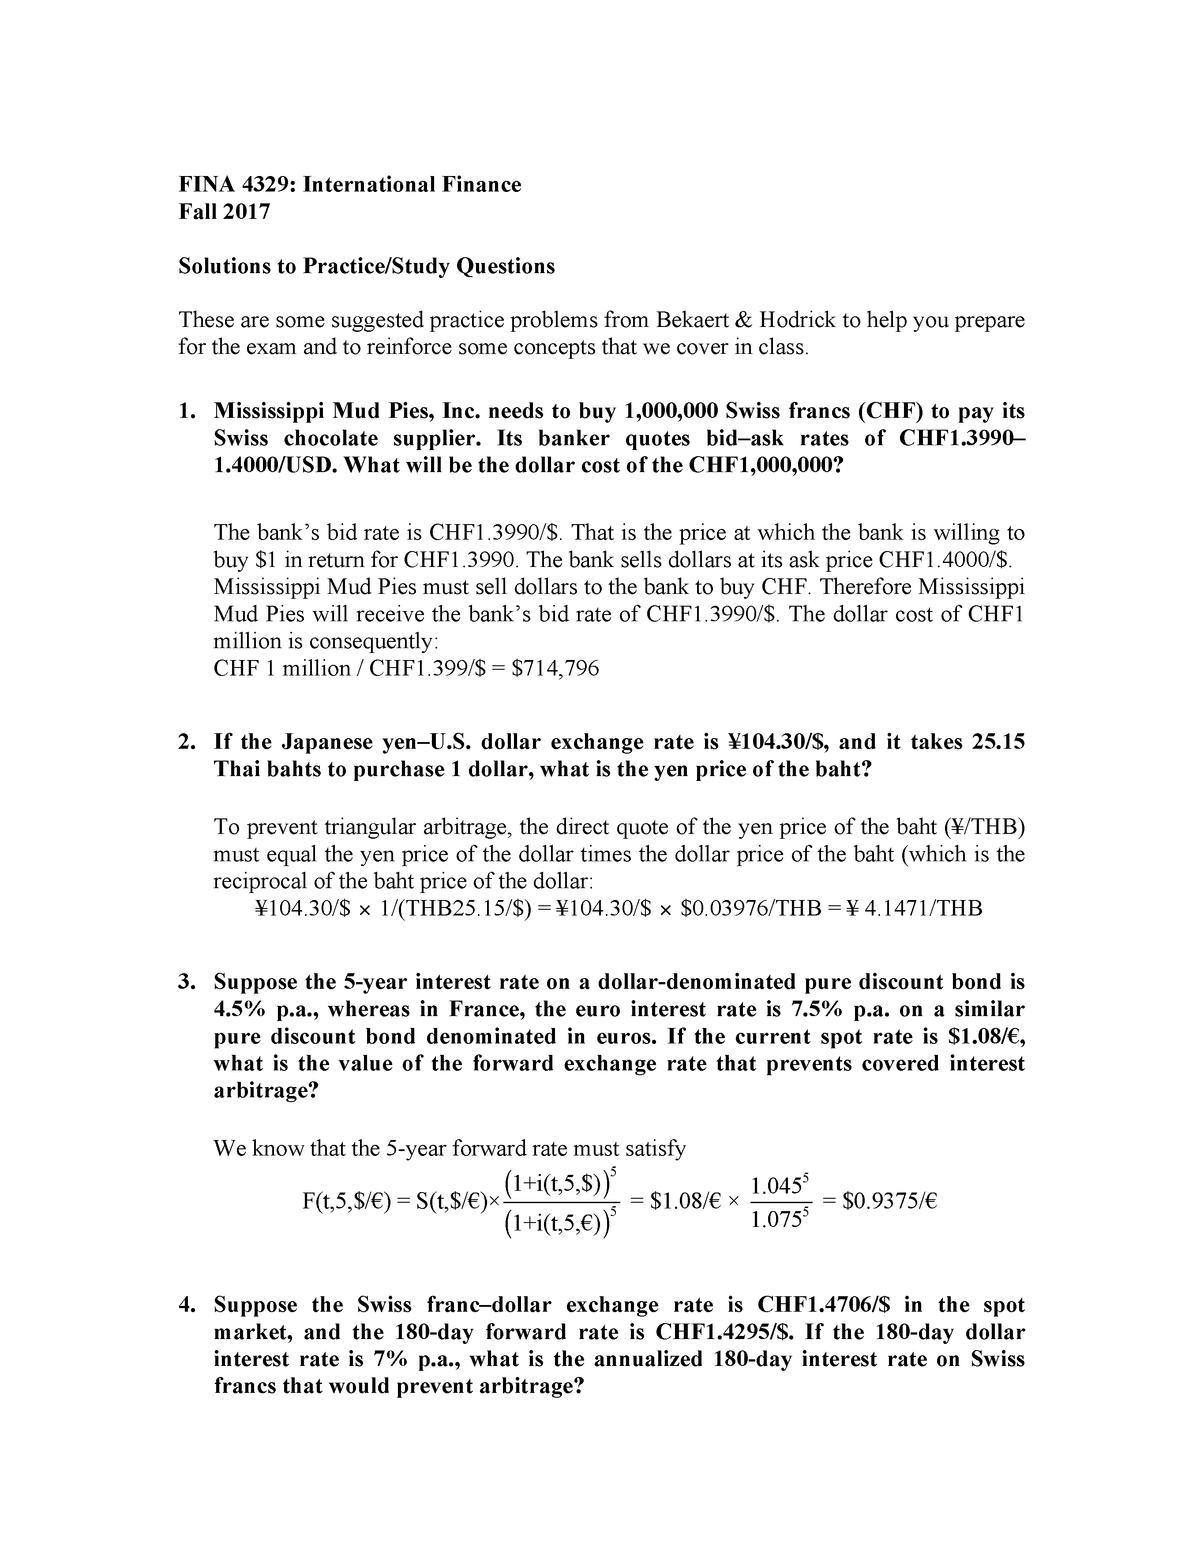 Practice Problem Set 1 Solutions - StuDocu